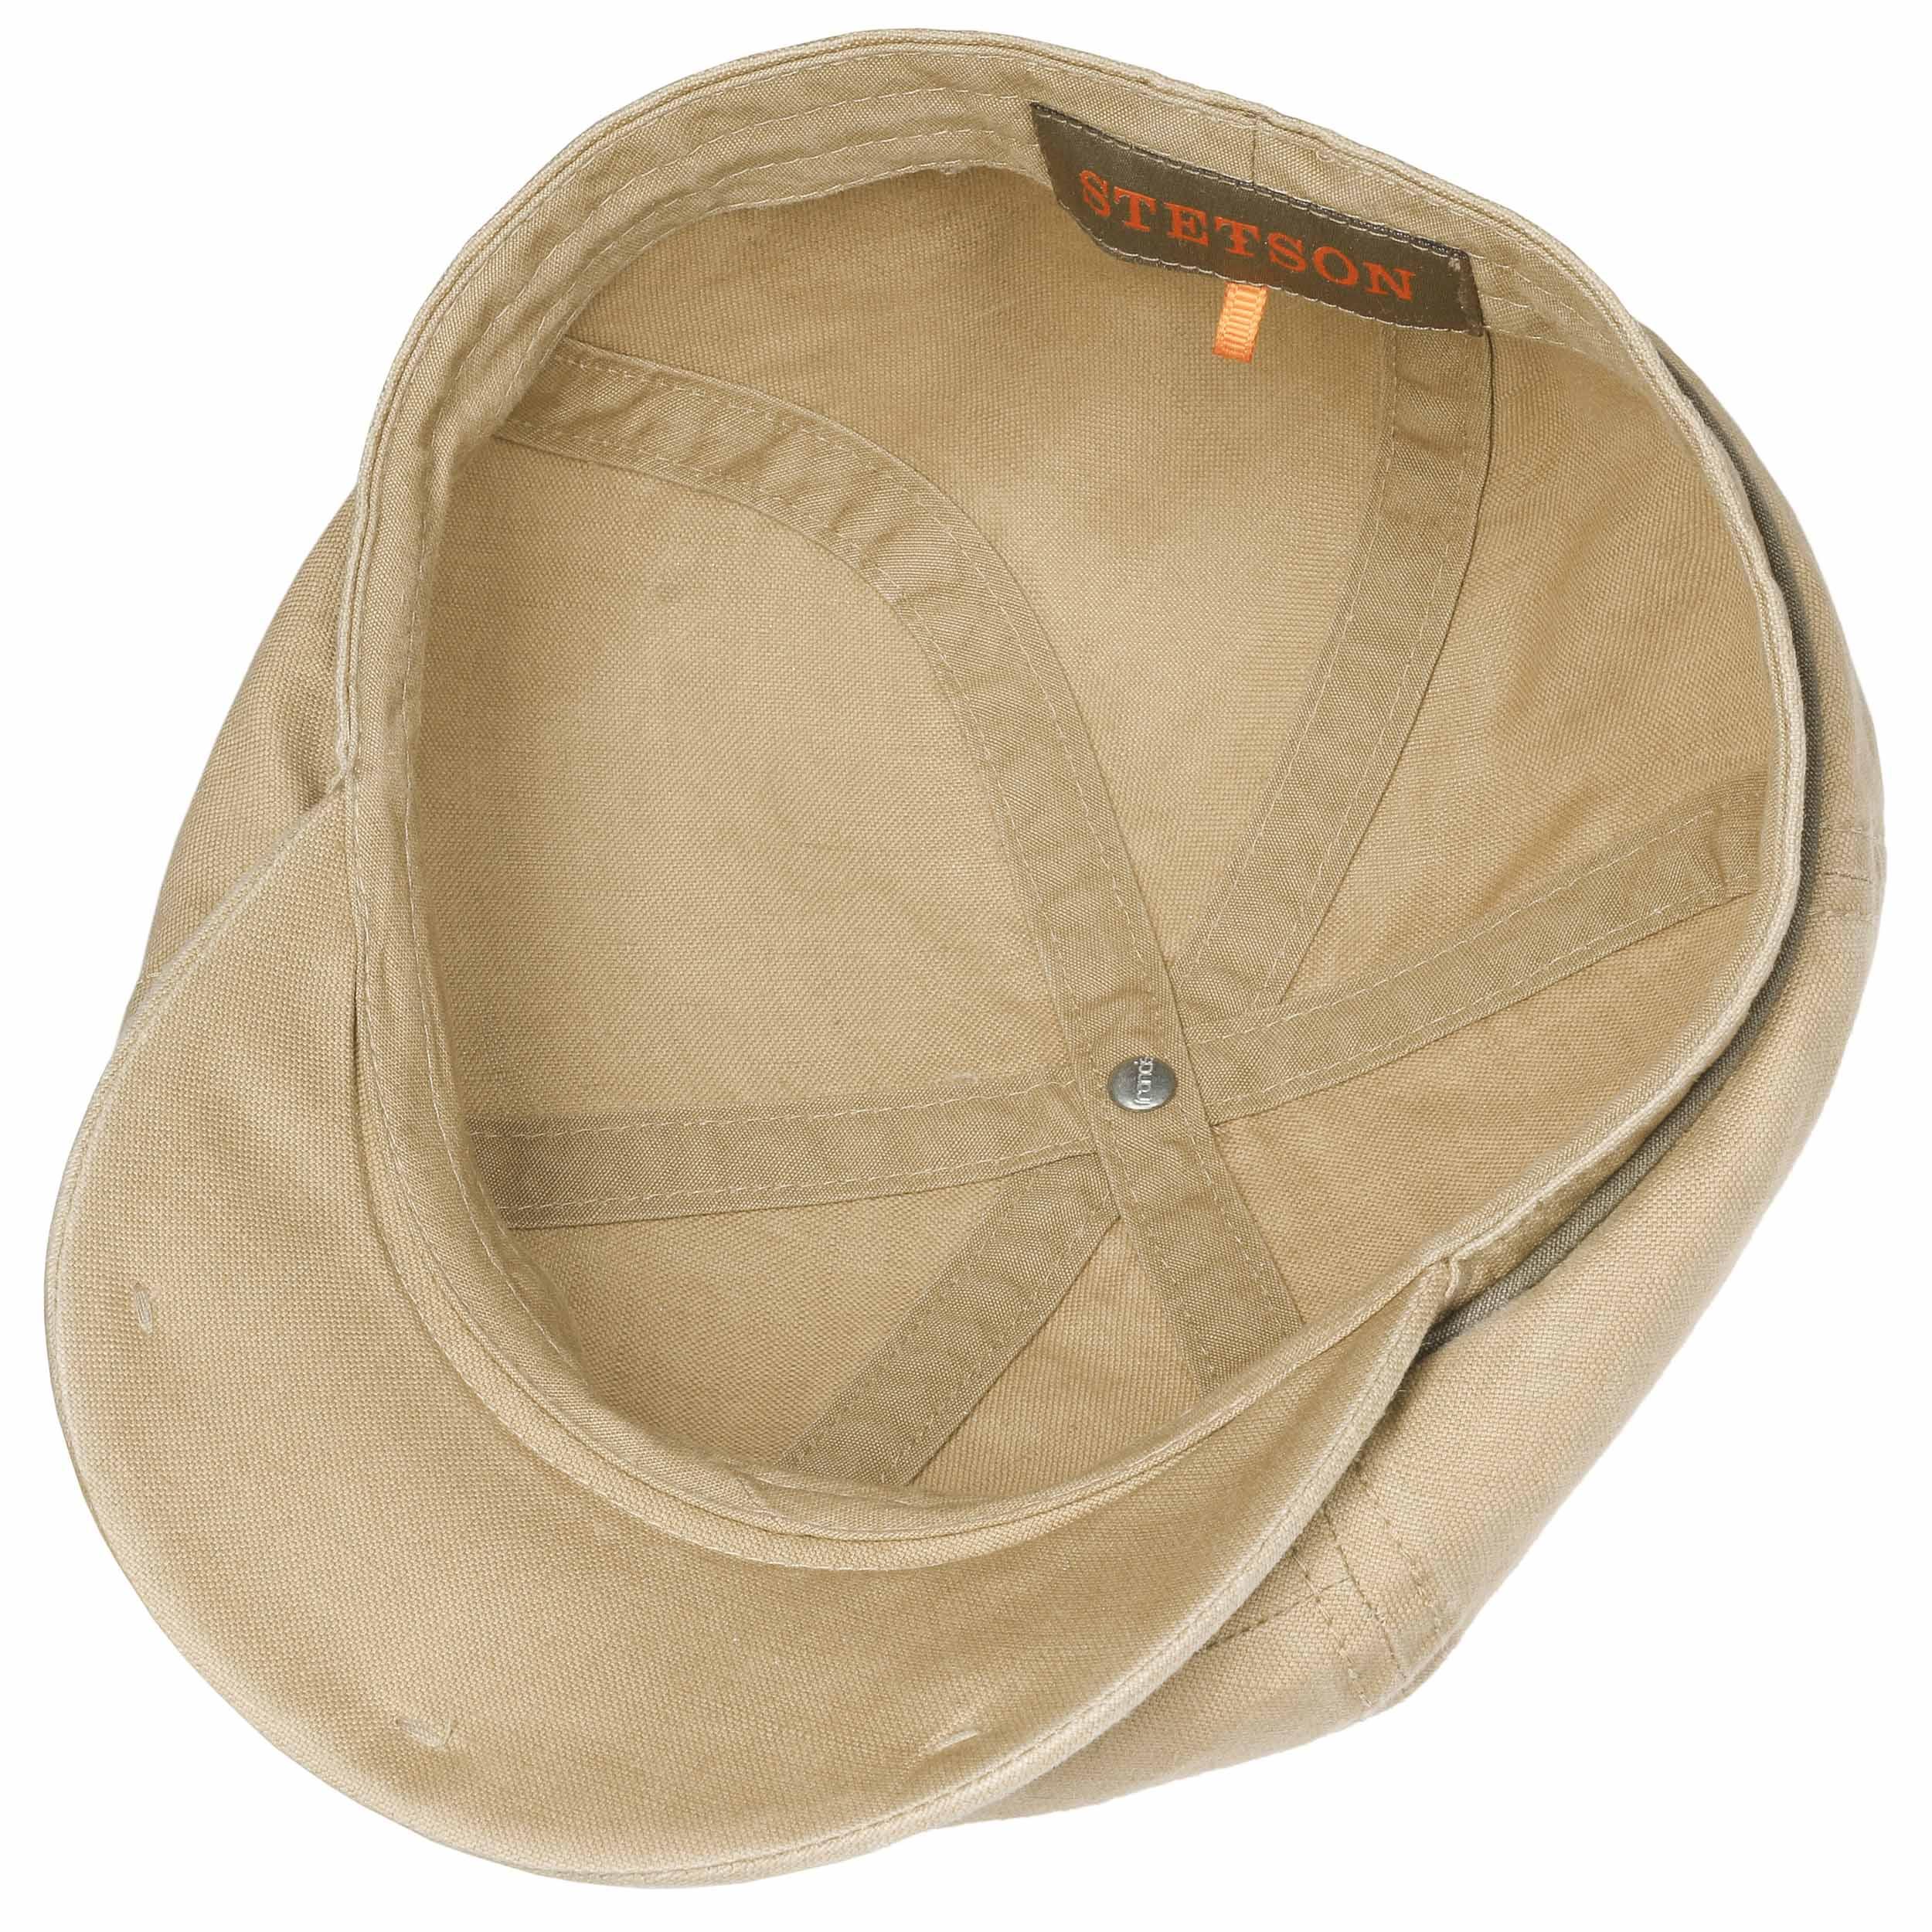 0ece2da5af0 ... Brooklin Cotton Newsboy Cap by Stetson - beige 2 ...